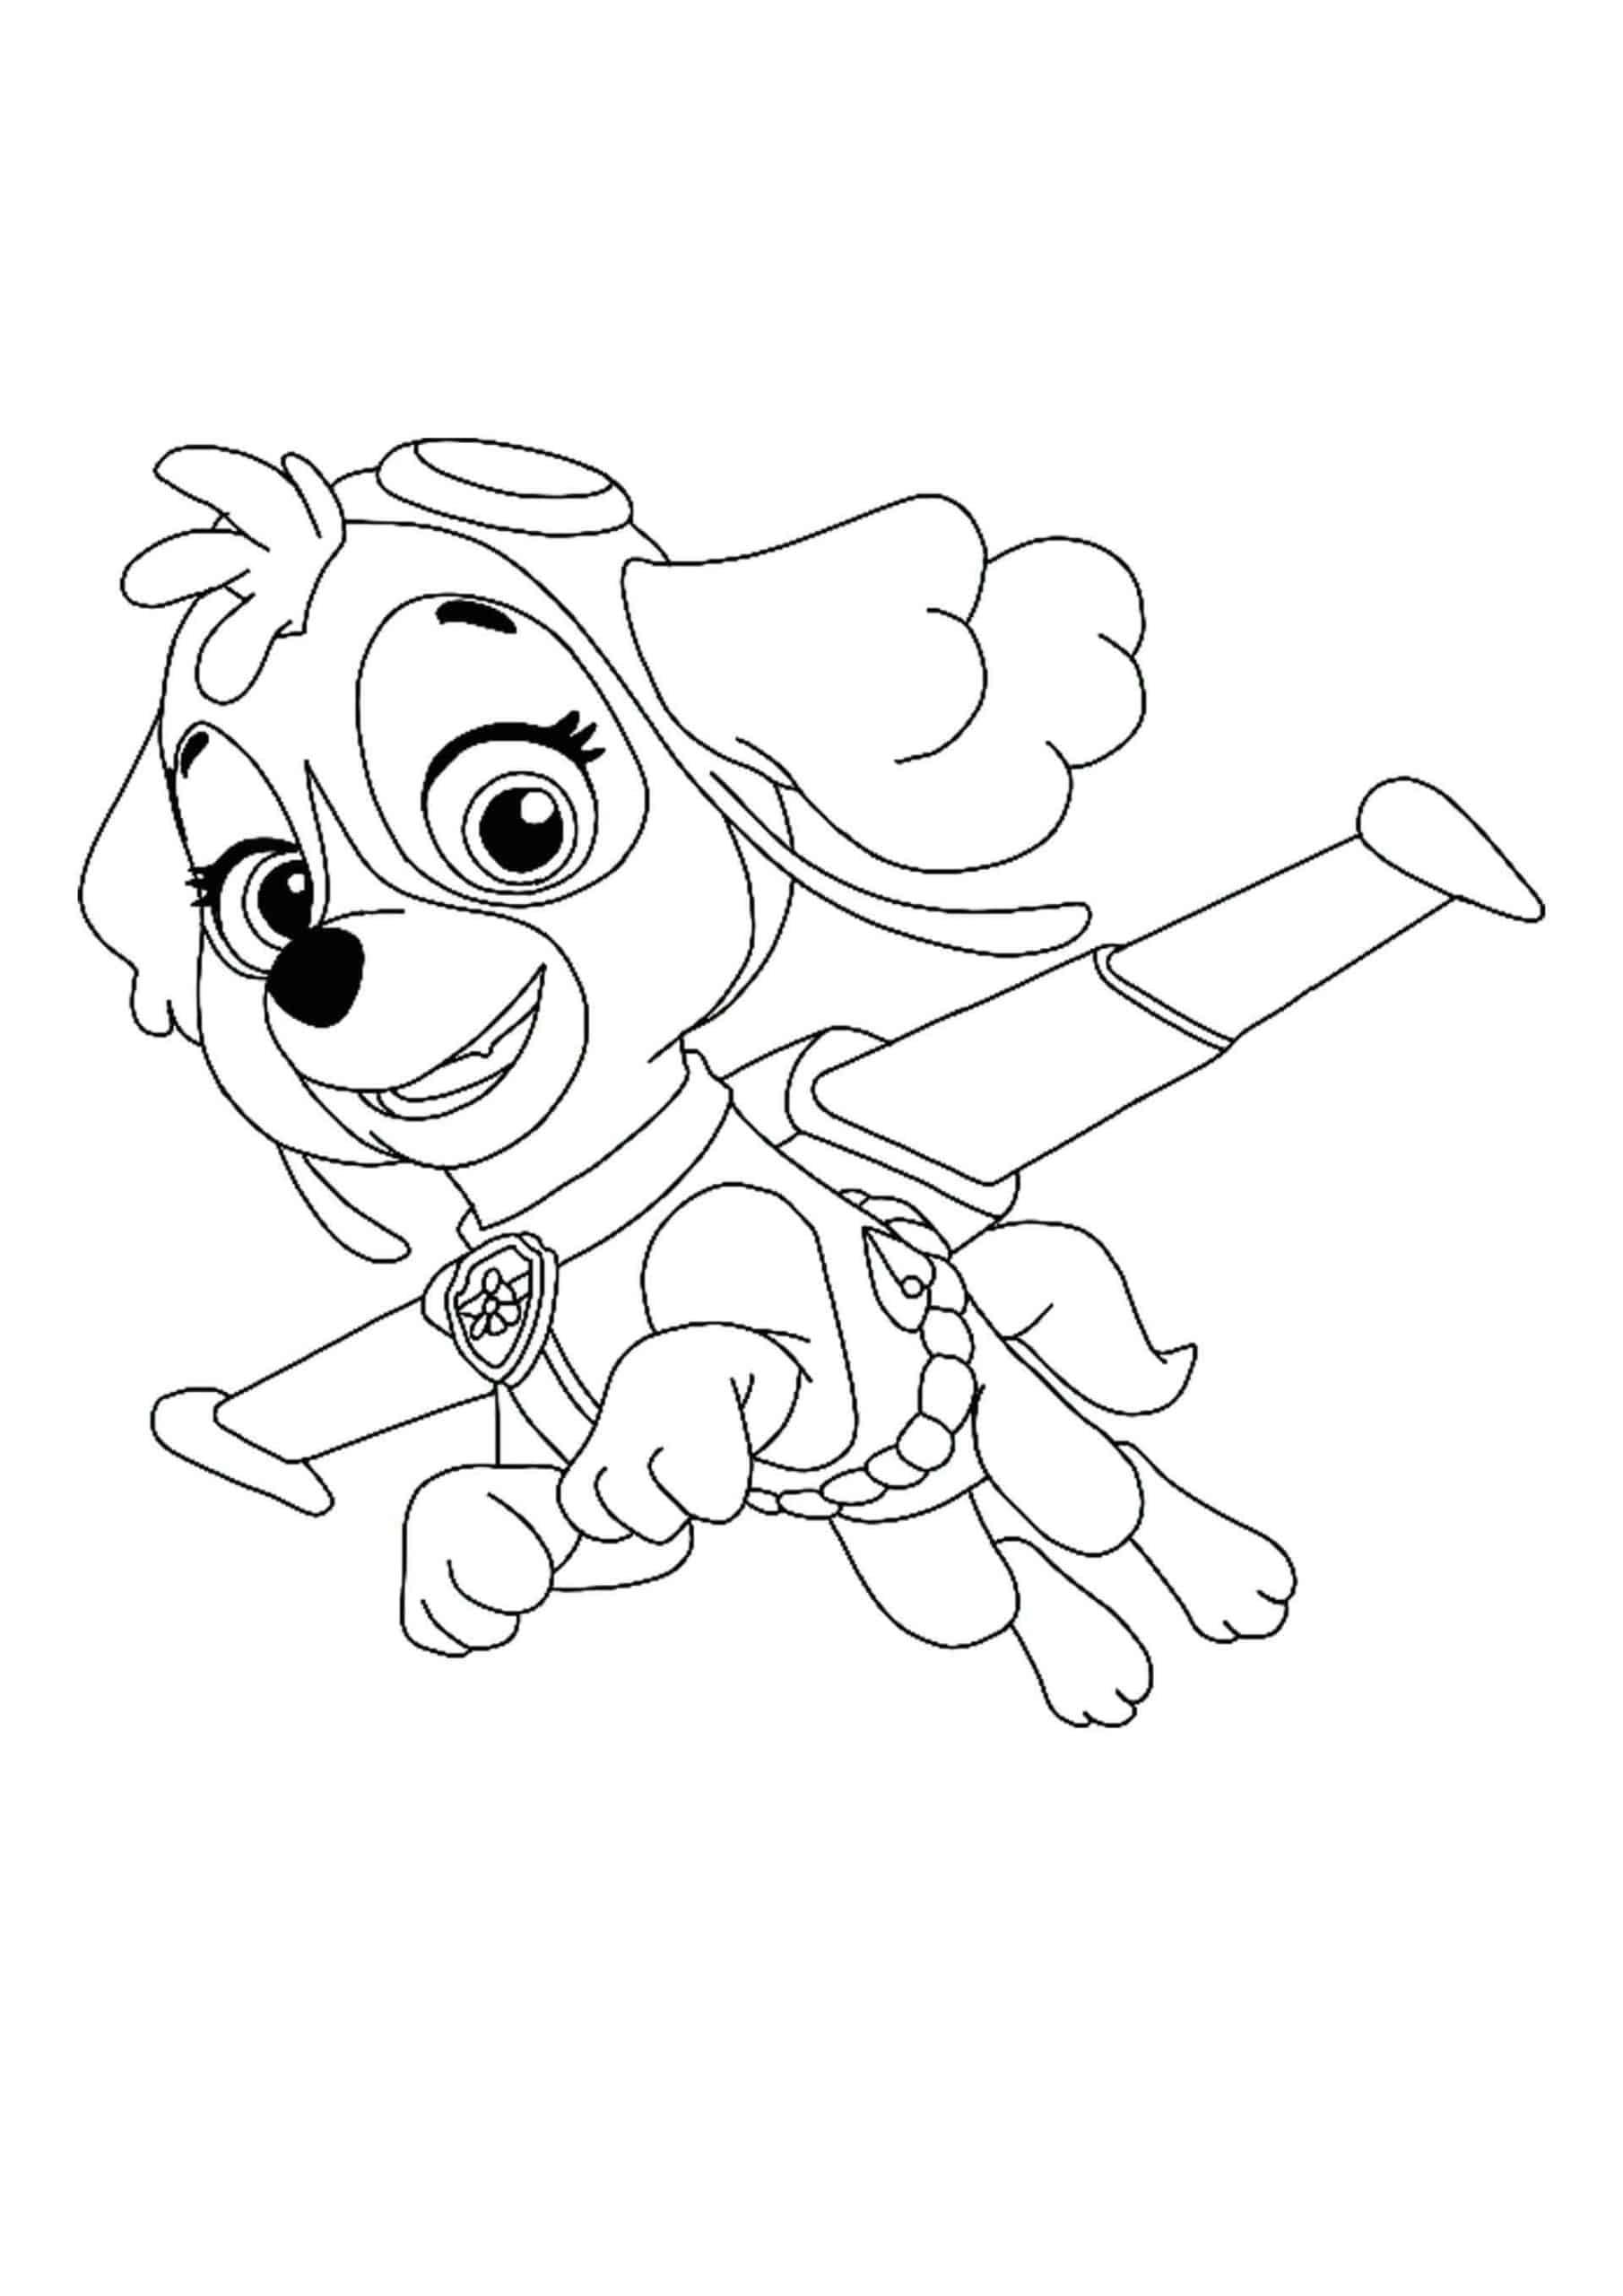 Paw Patrol Skye coloring page